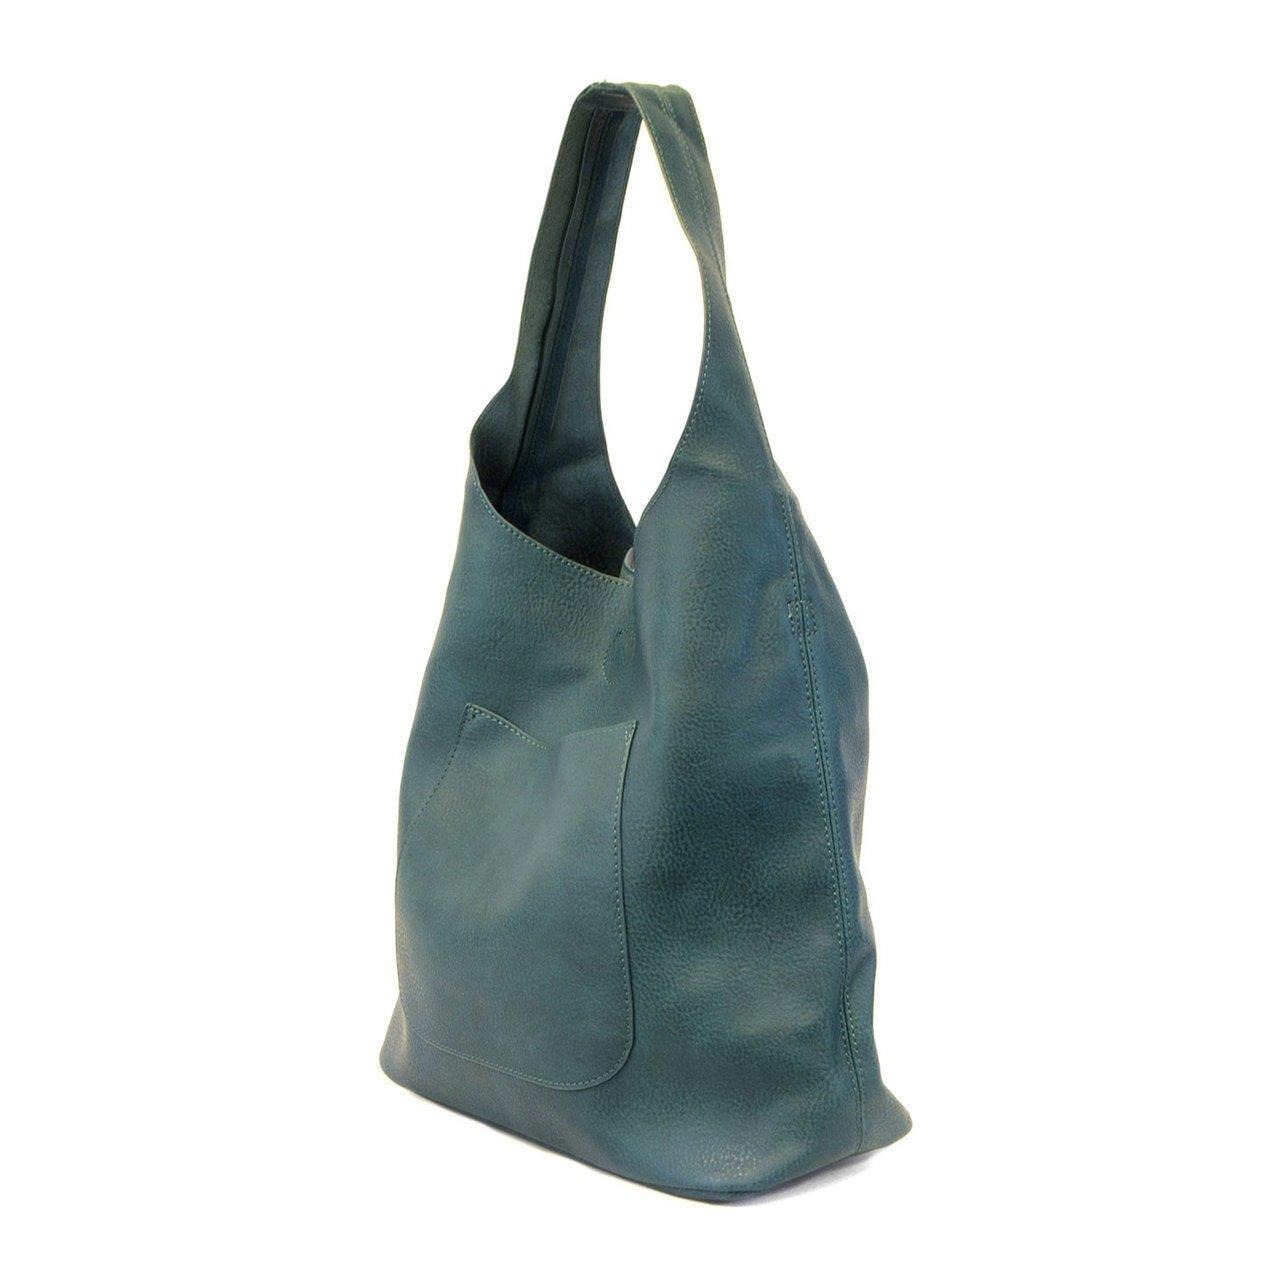 f652cef856 Amazon.com  Joy Susan Molly Slouchy Hobo Handbag